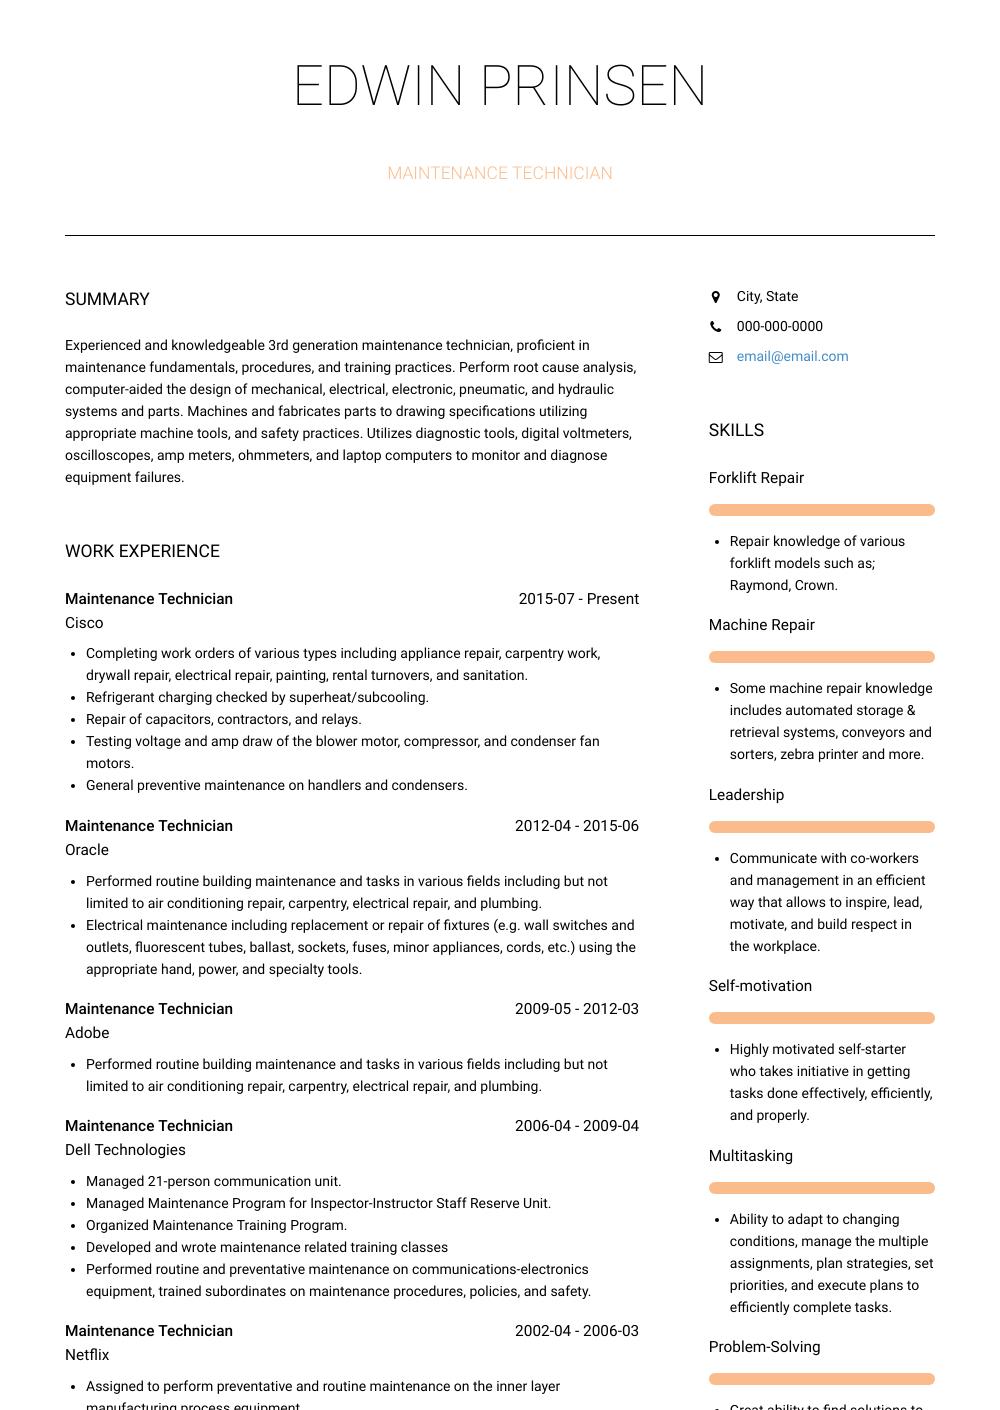 Maintenance Technician - Resume Samples & Templates | VisualCV